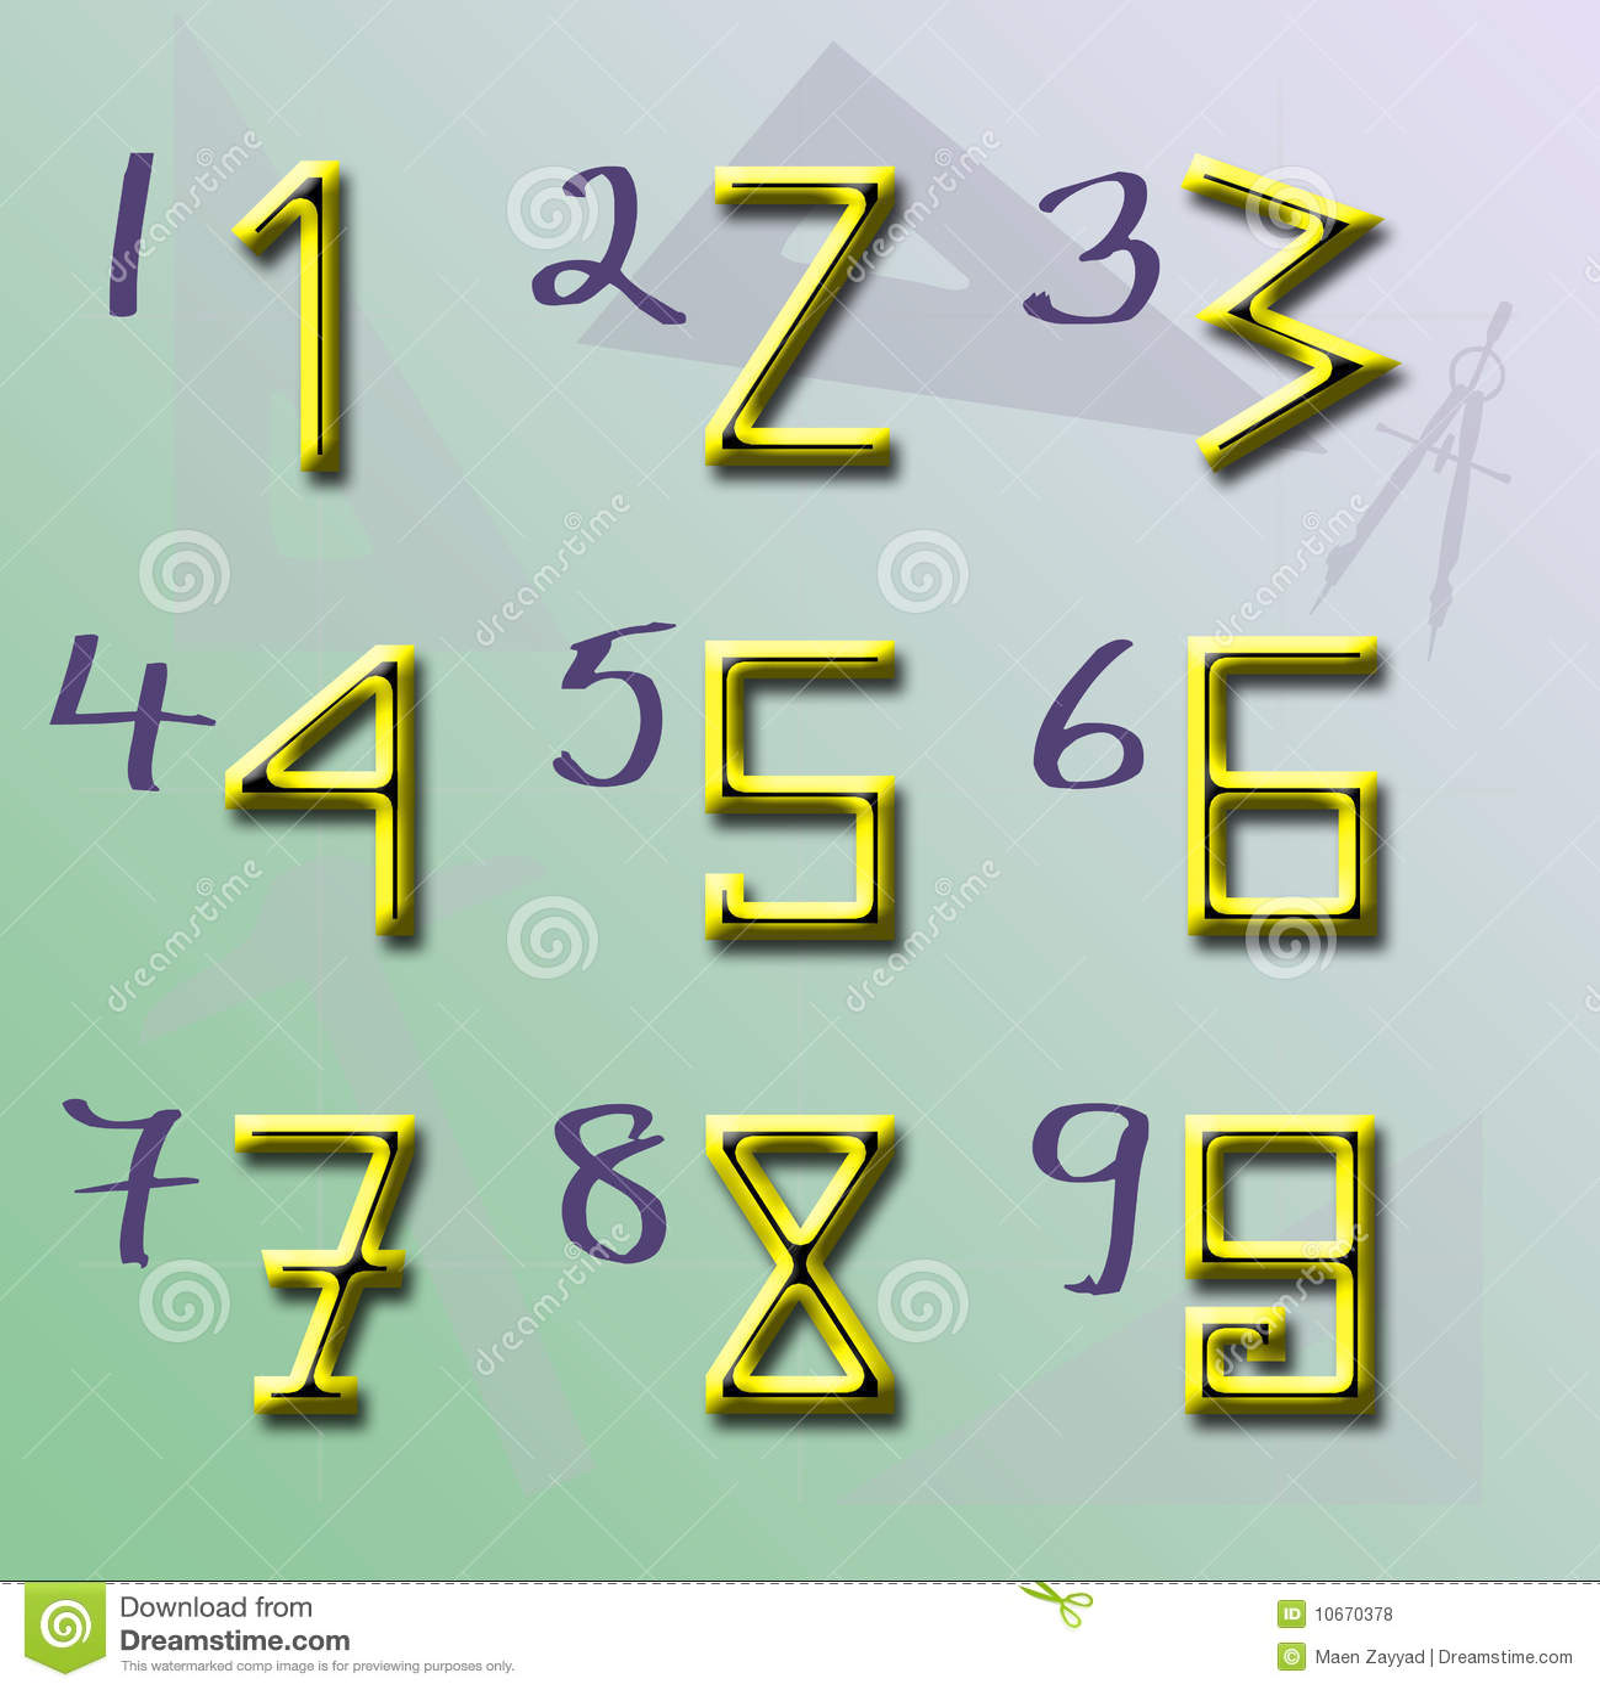 Origin of Numbers shape V2